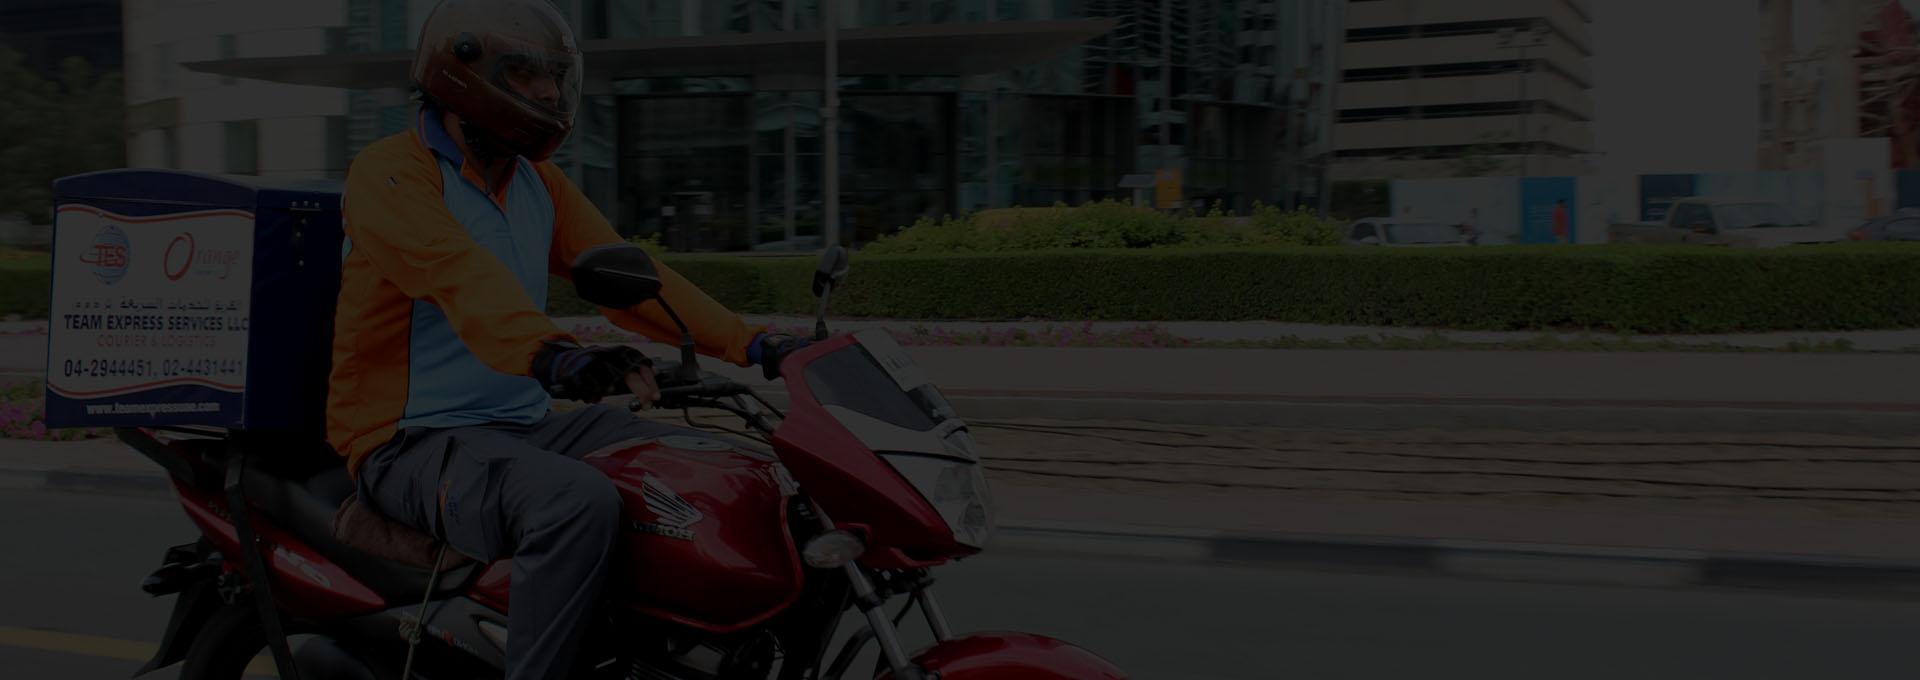 bike-delivary